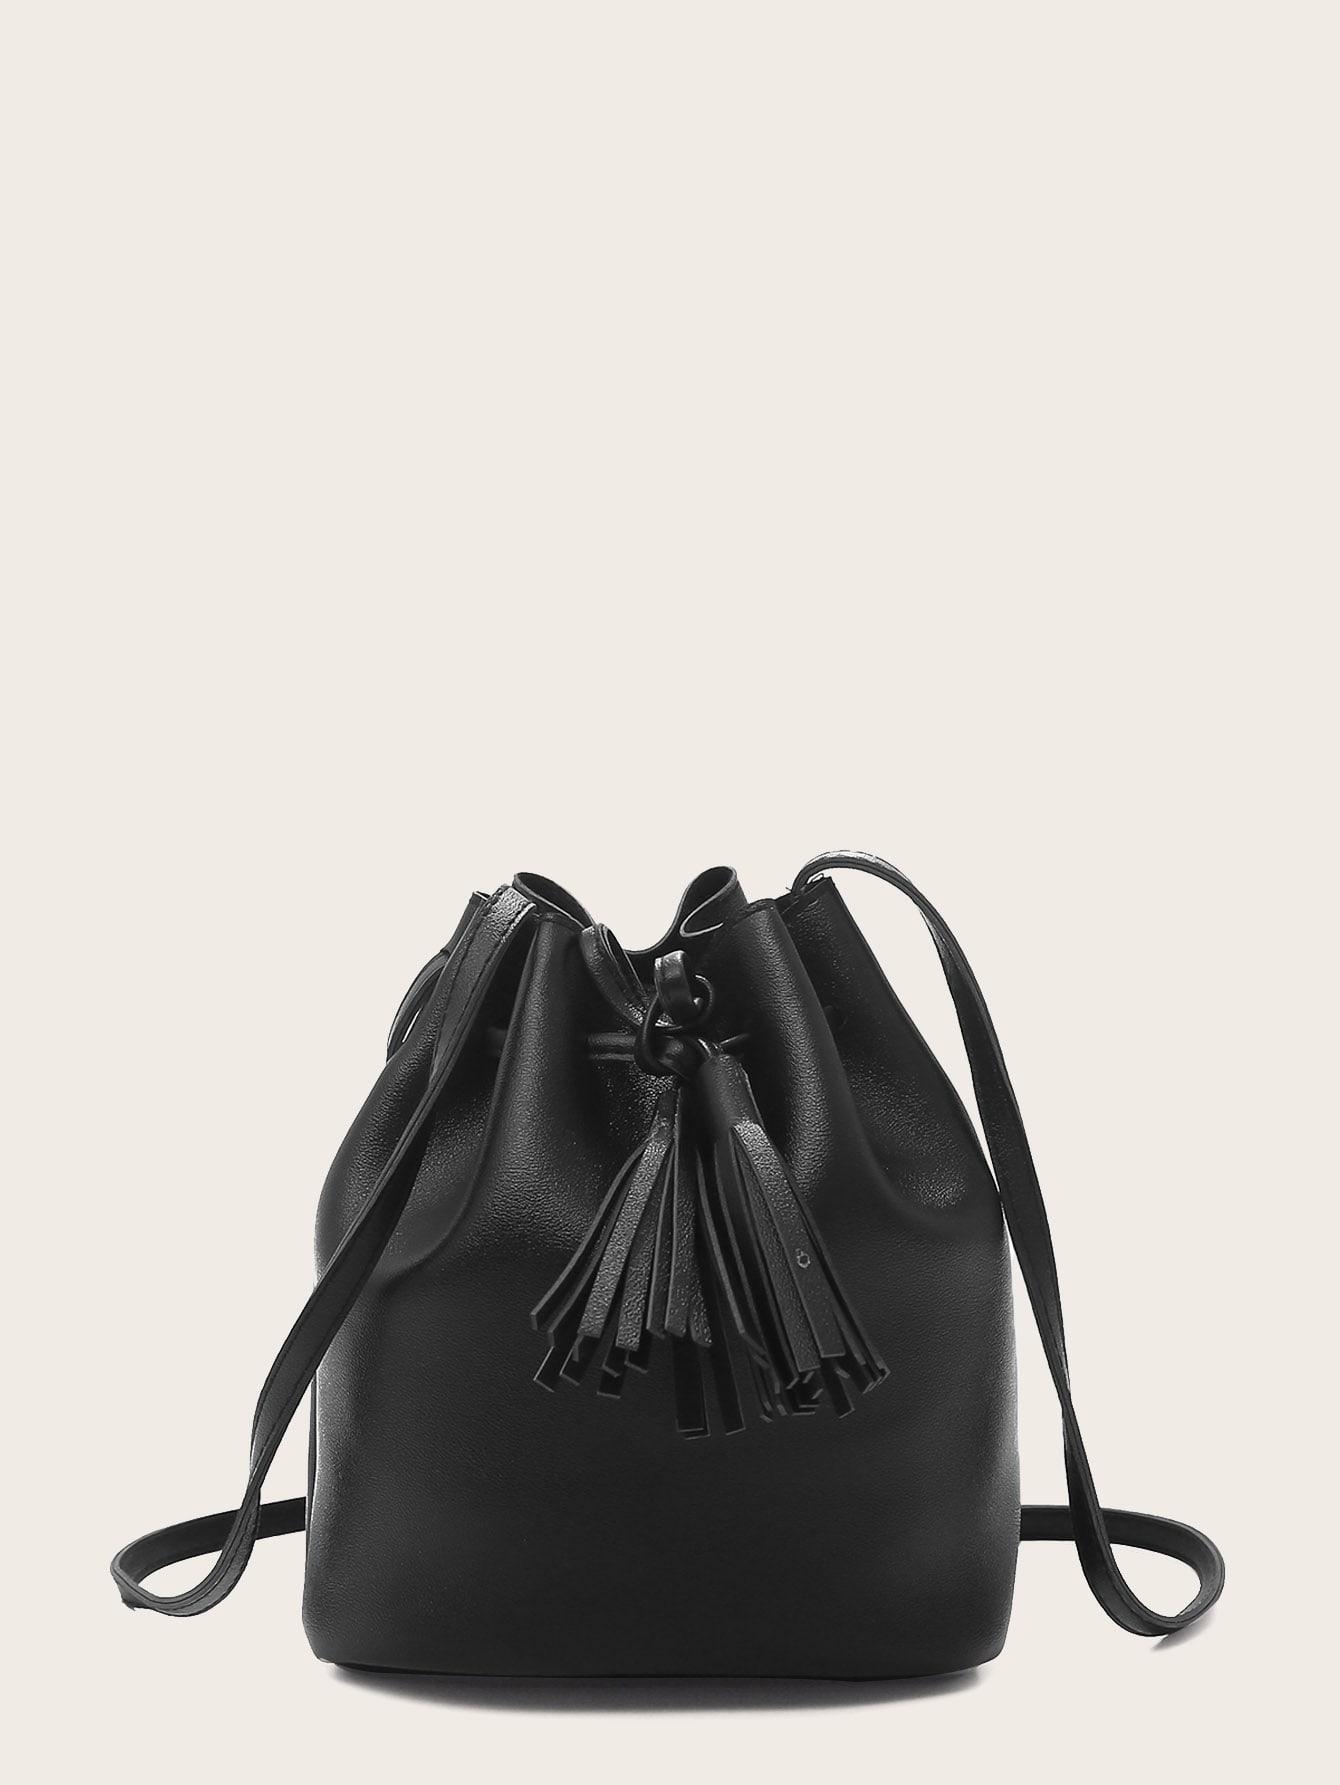 Фото - Сумку-ведро с кулиской с бахромой от SheIn черного цвета